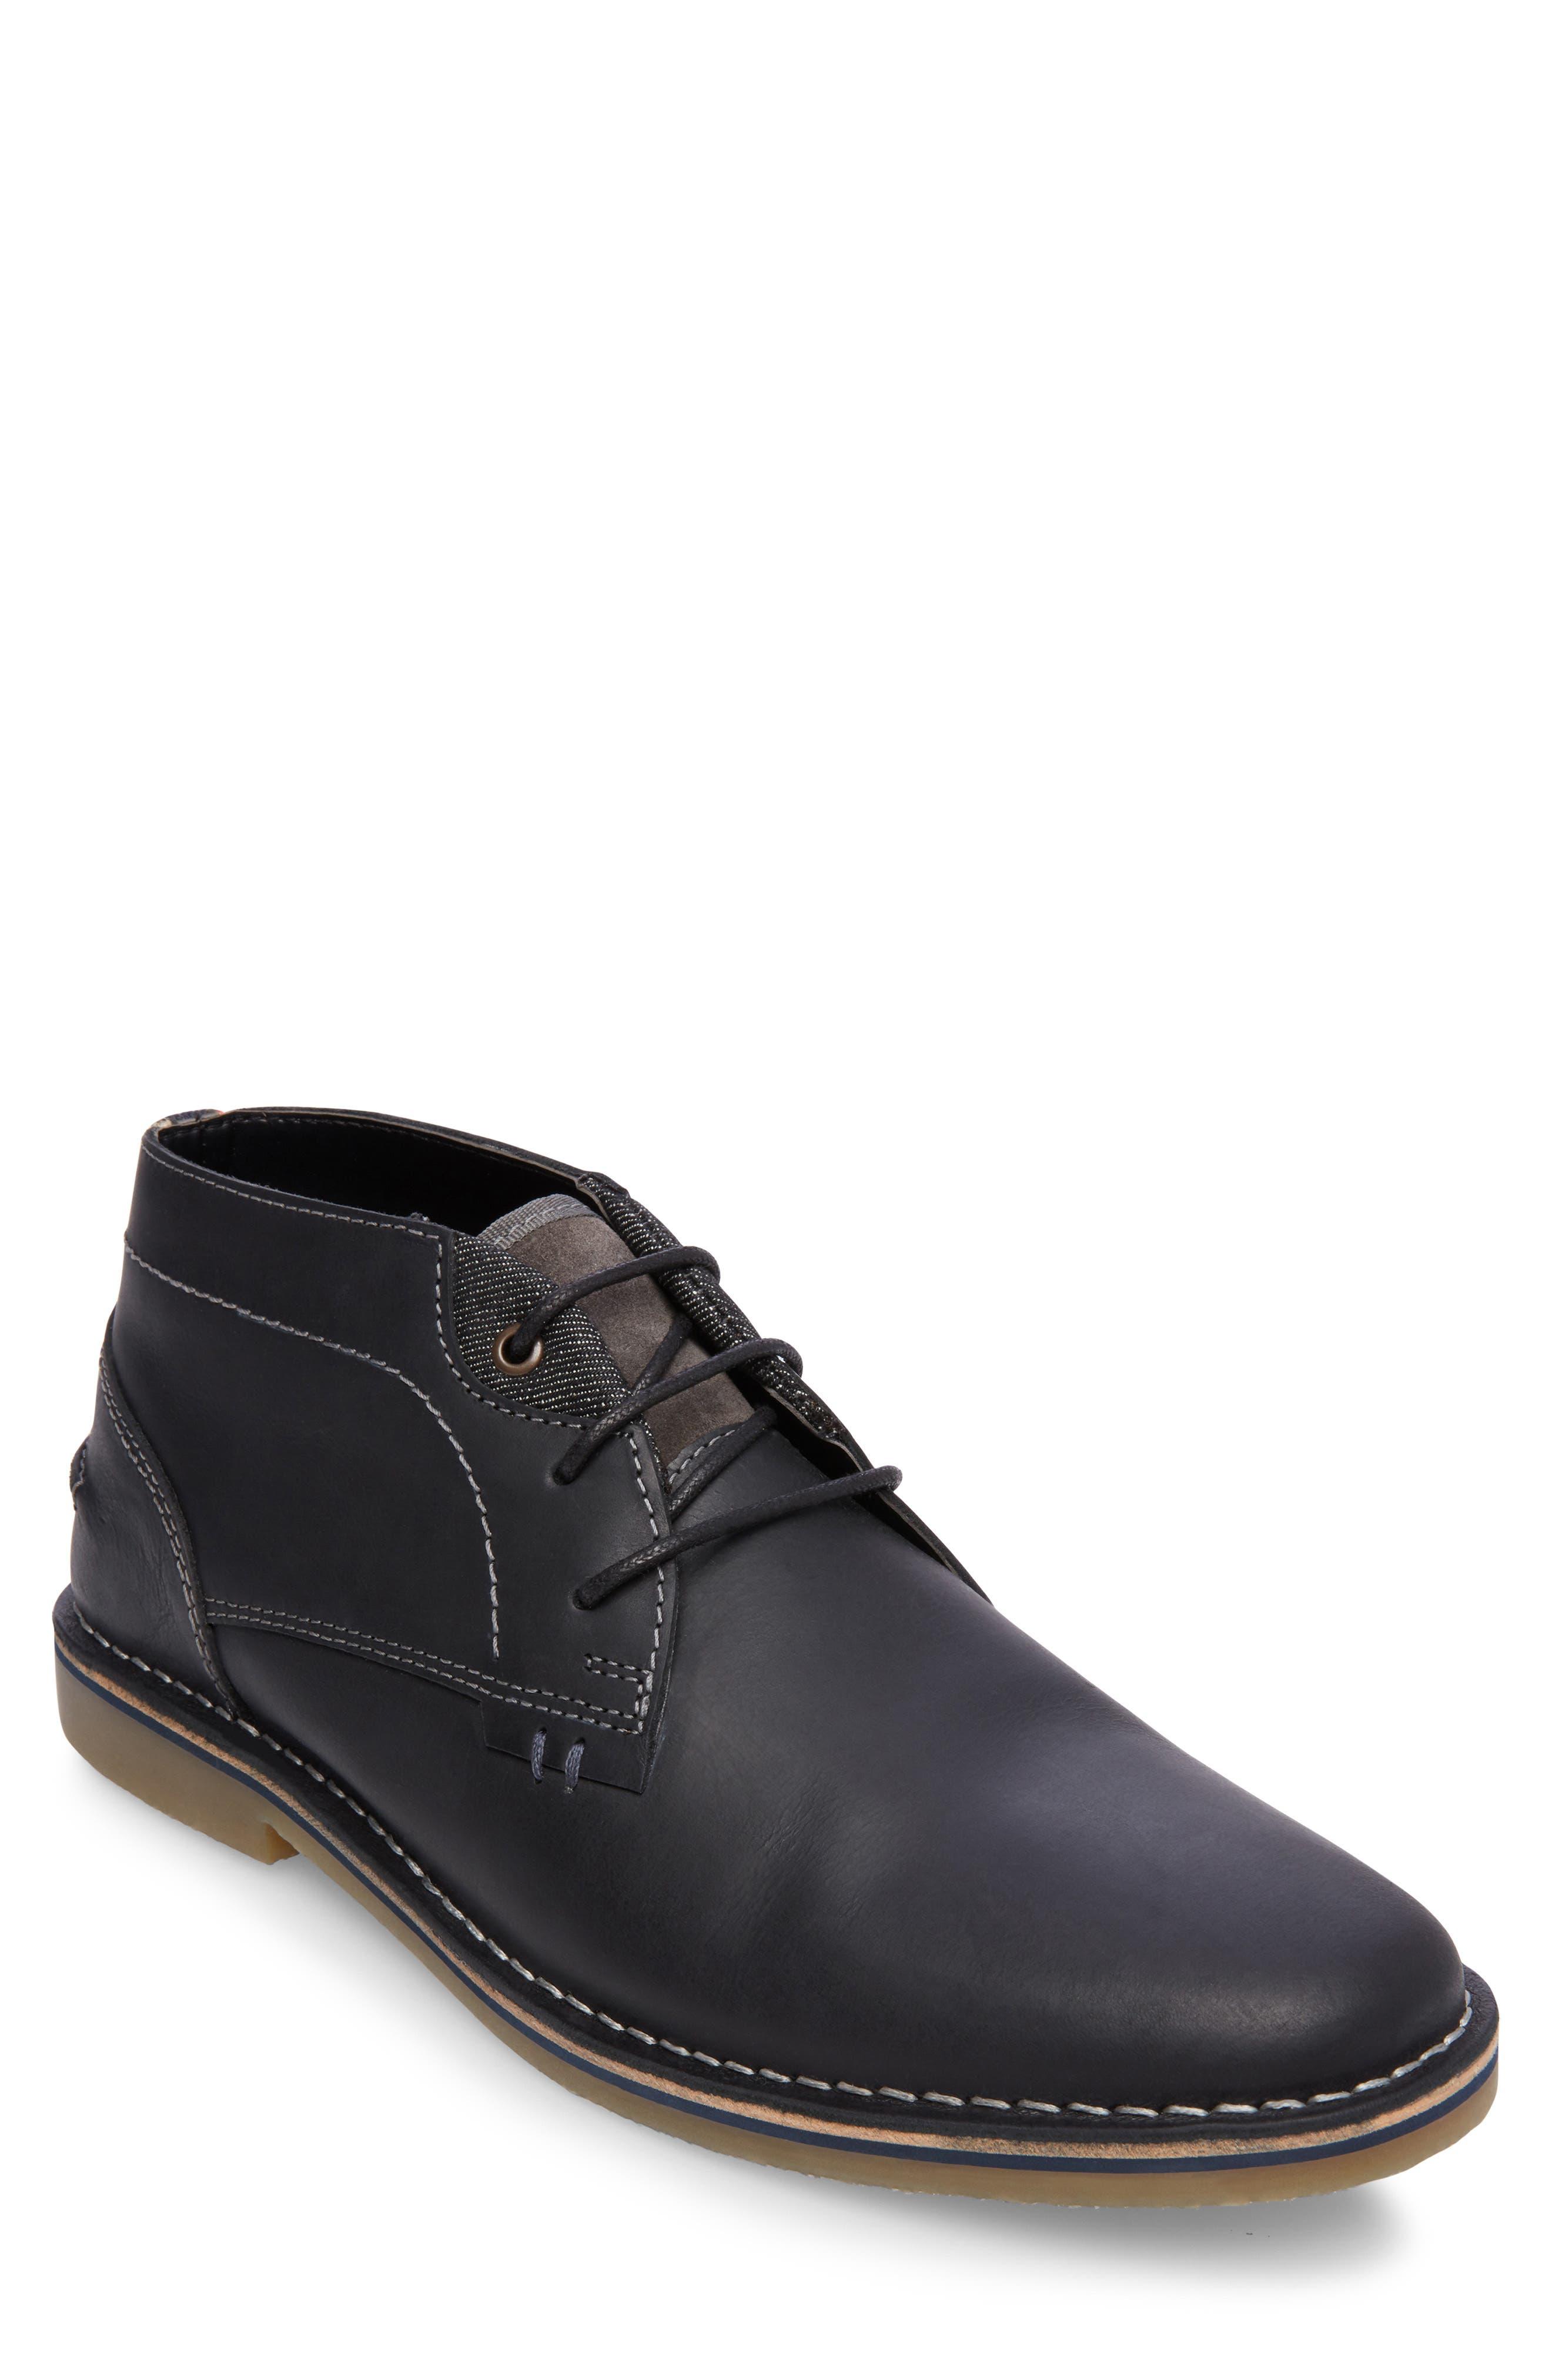 Hinton Chukka Boot,                         Main,                         color, 001